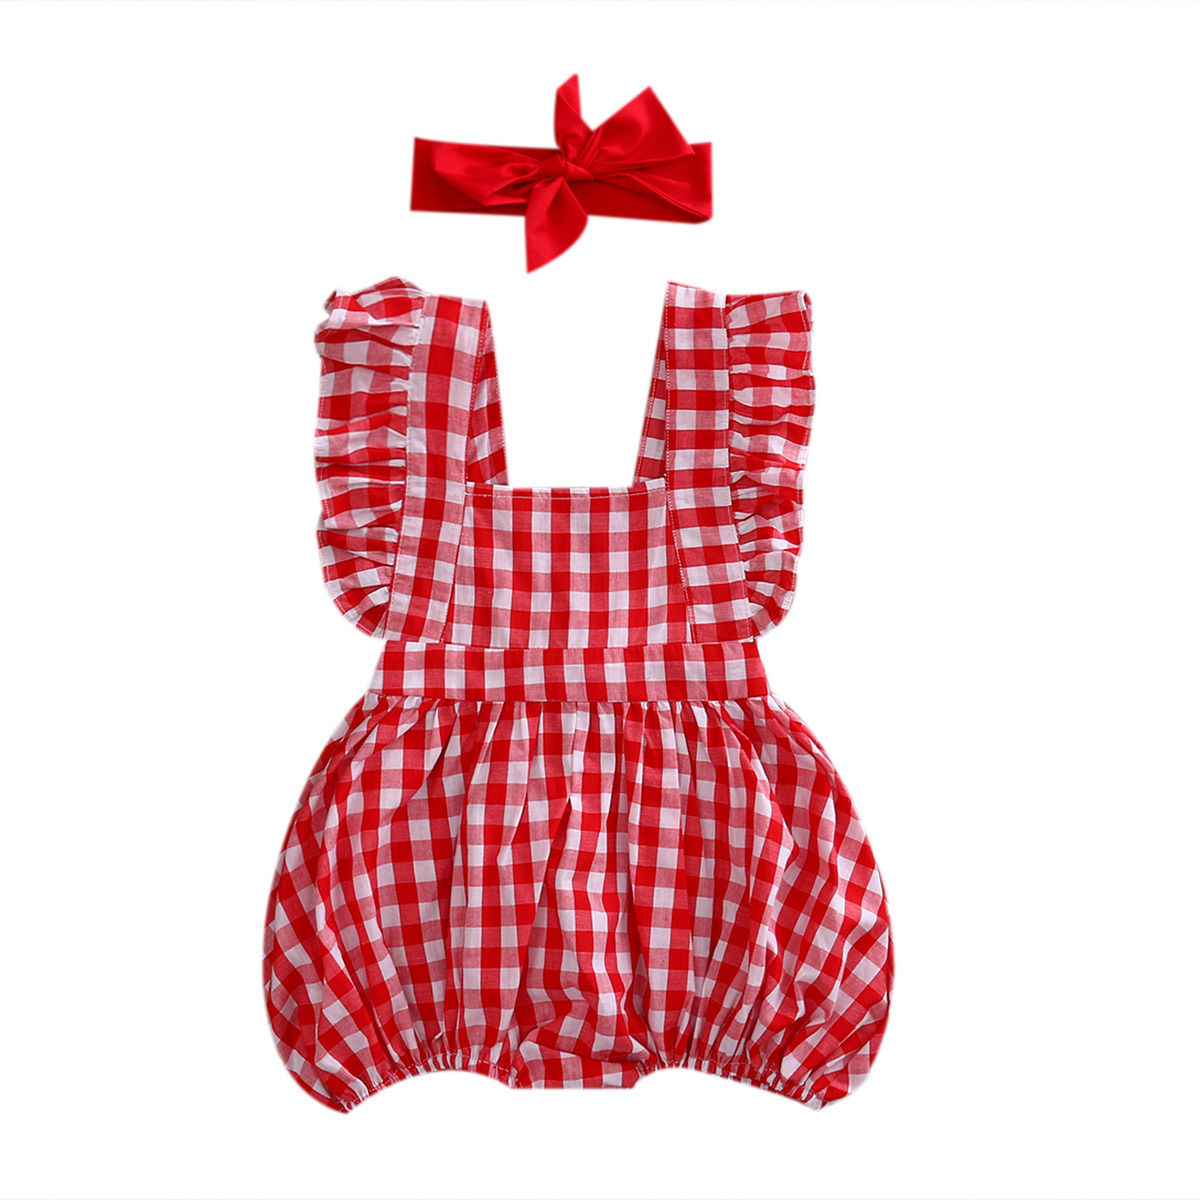 цены  2017 Summer Red Plaid Newborn Baby Girls Clothes Ruffled Baby Romper Jumpsuit +Headband 2PCS Outfits Sunsuit Children Clothing